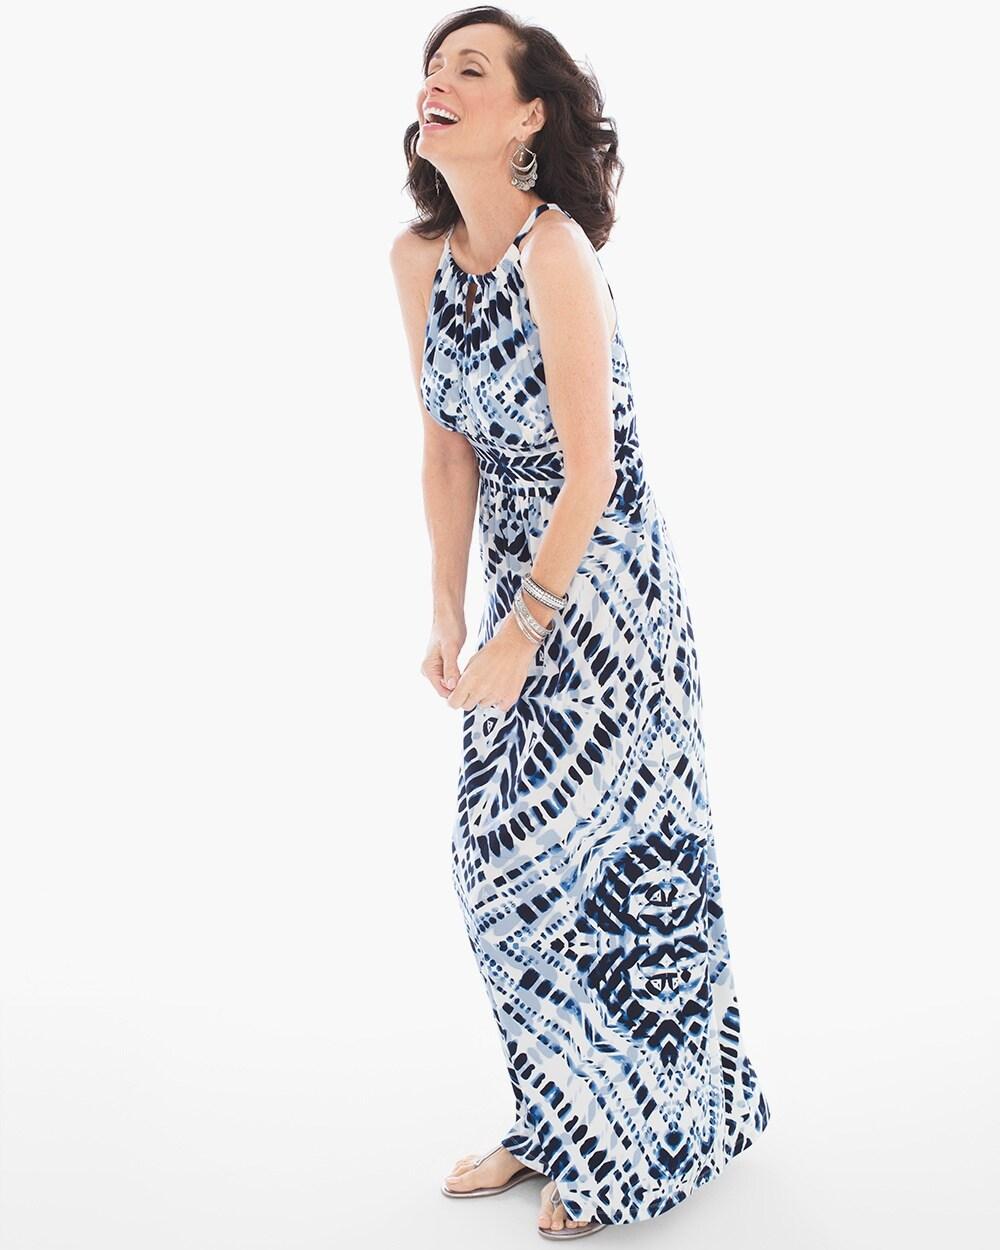 Blue Diamond Tie-Dye Maxi Dress - Chicos